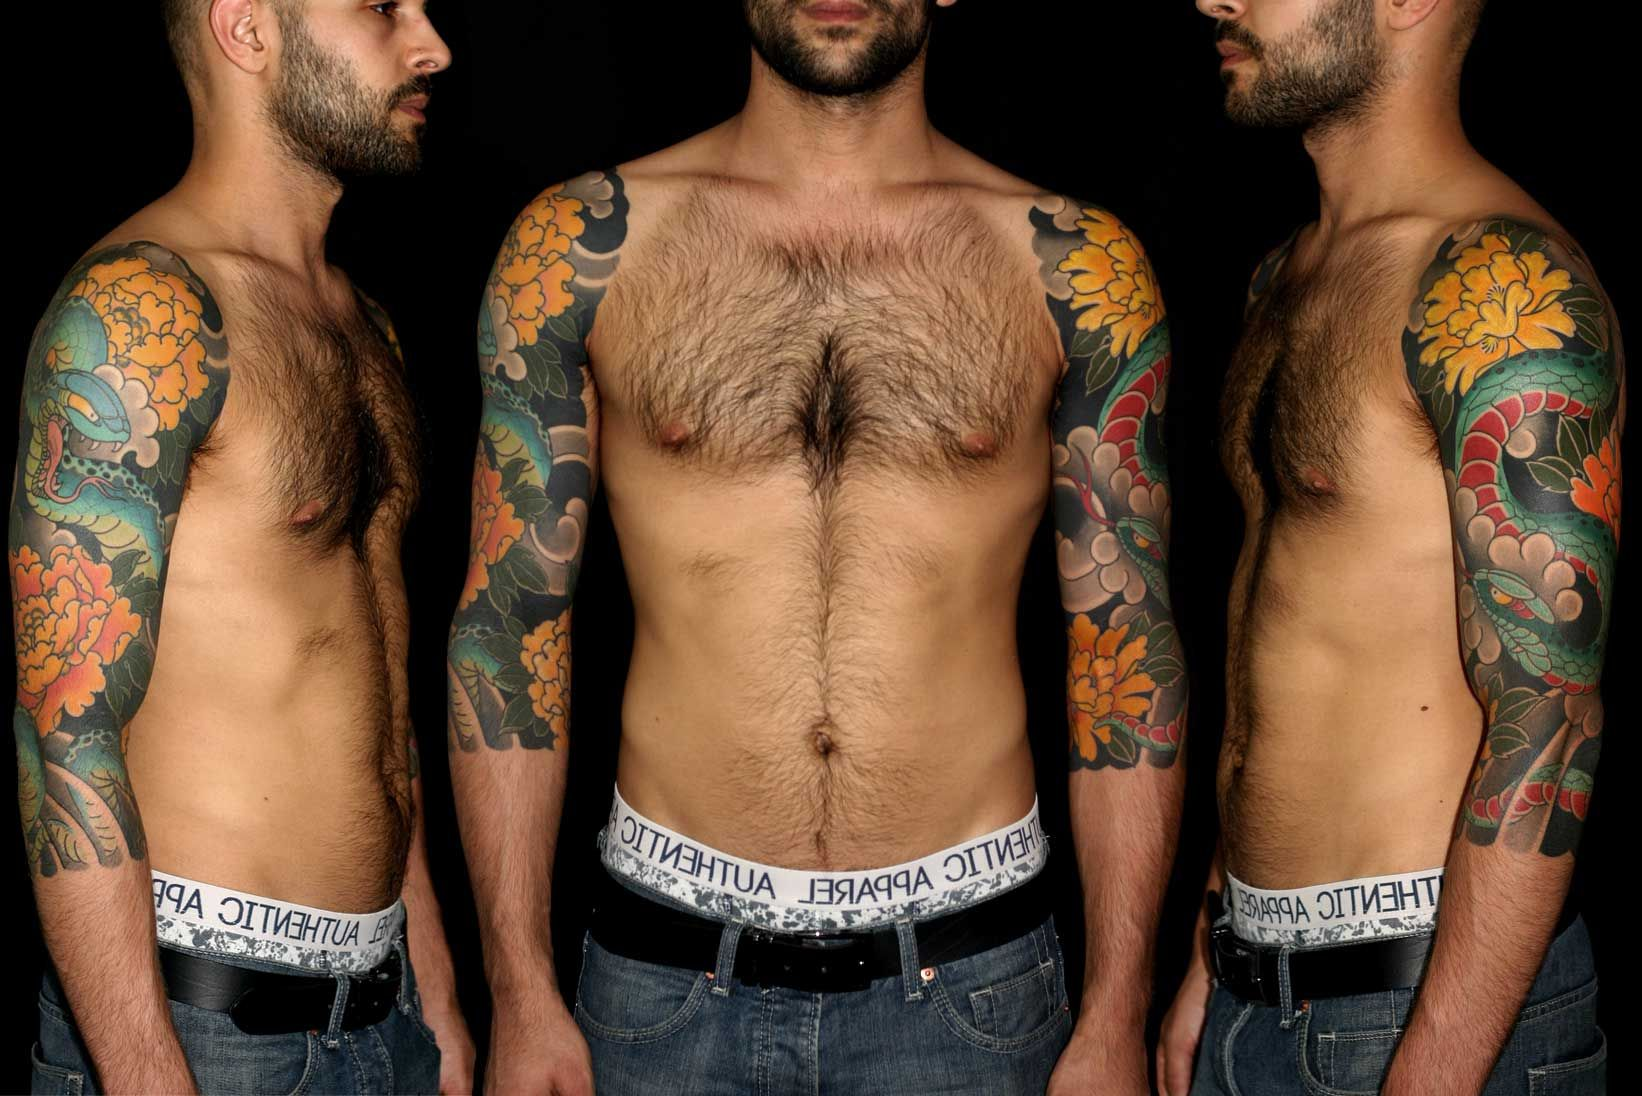 Tattooing luca ortis irezumi serpiente pinterest tattoos